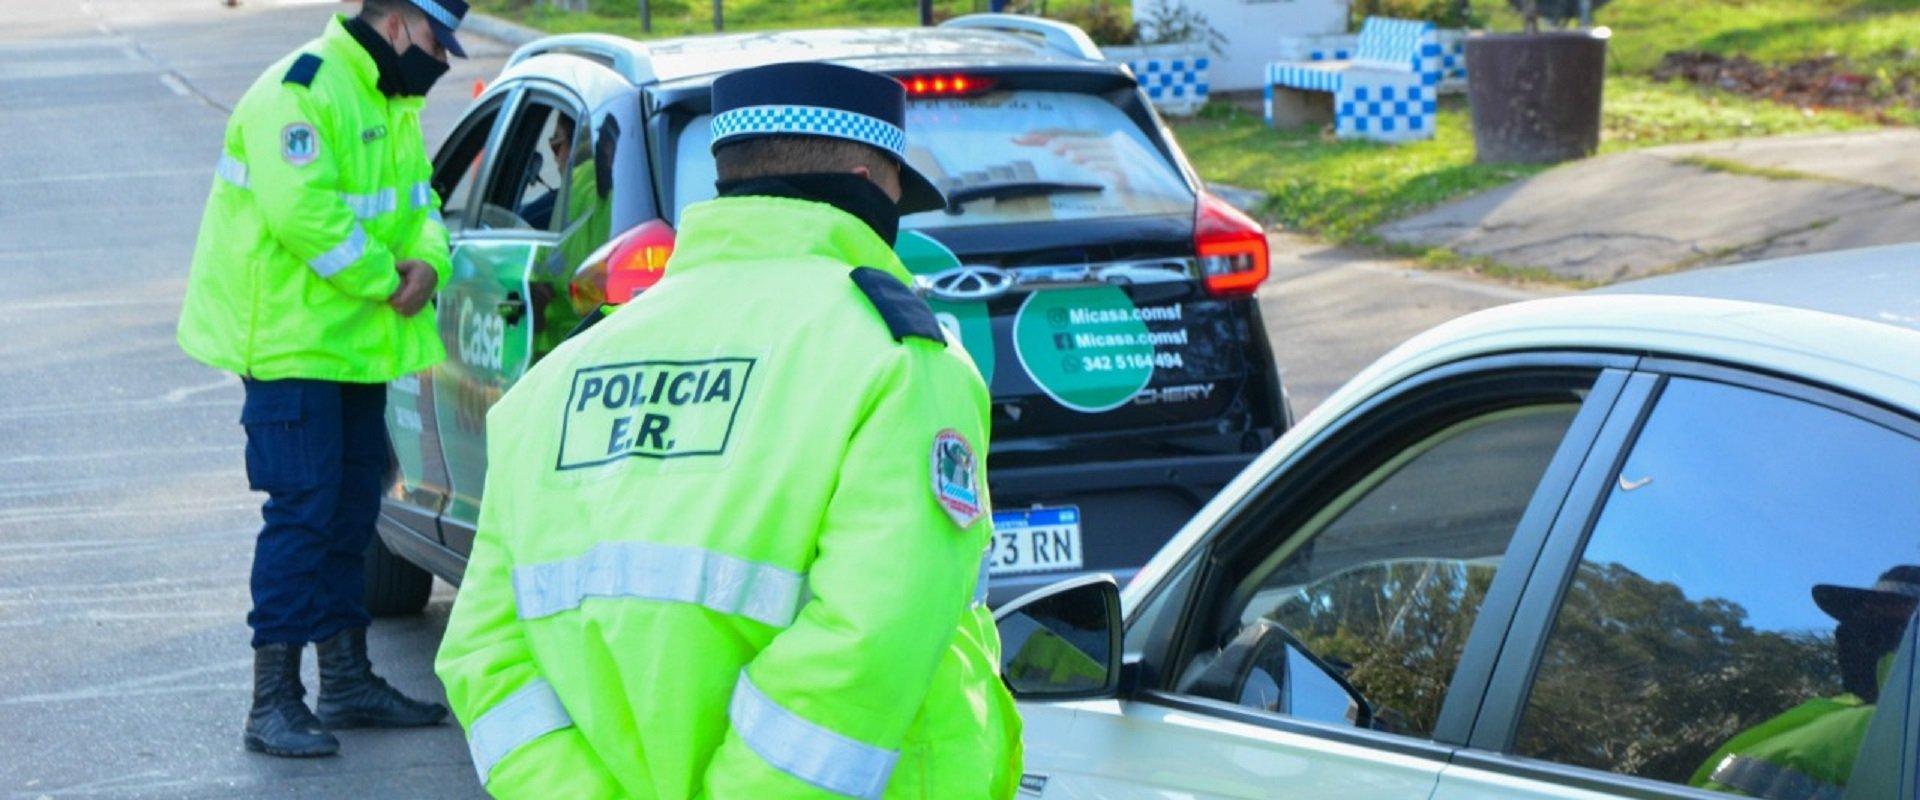 Control Tránsito Policial